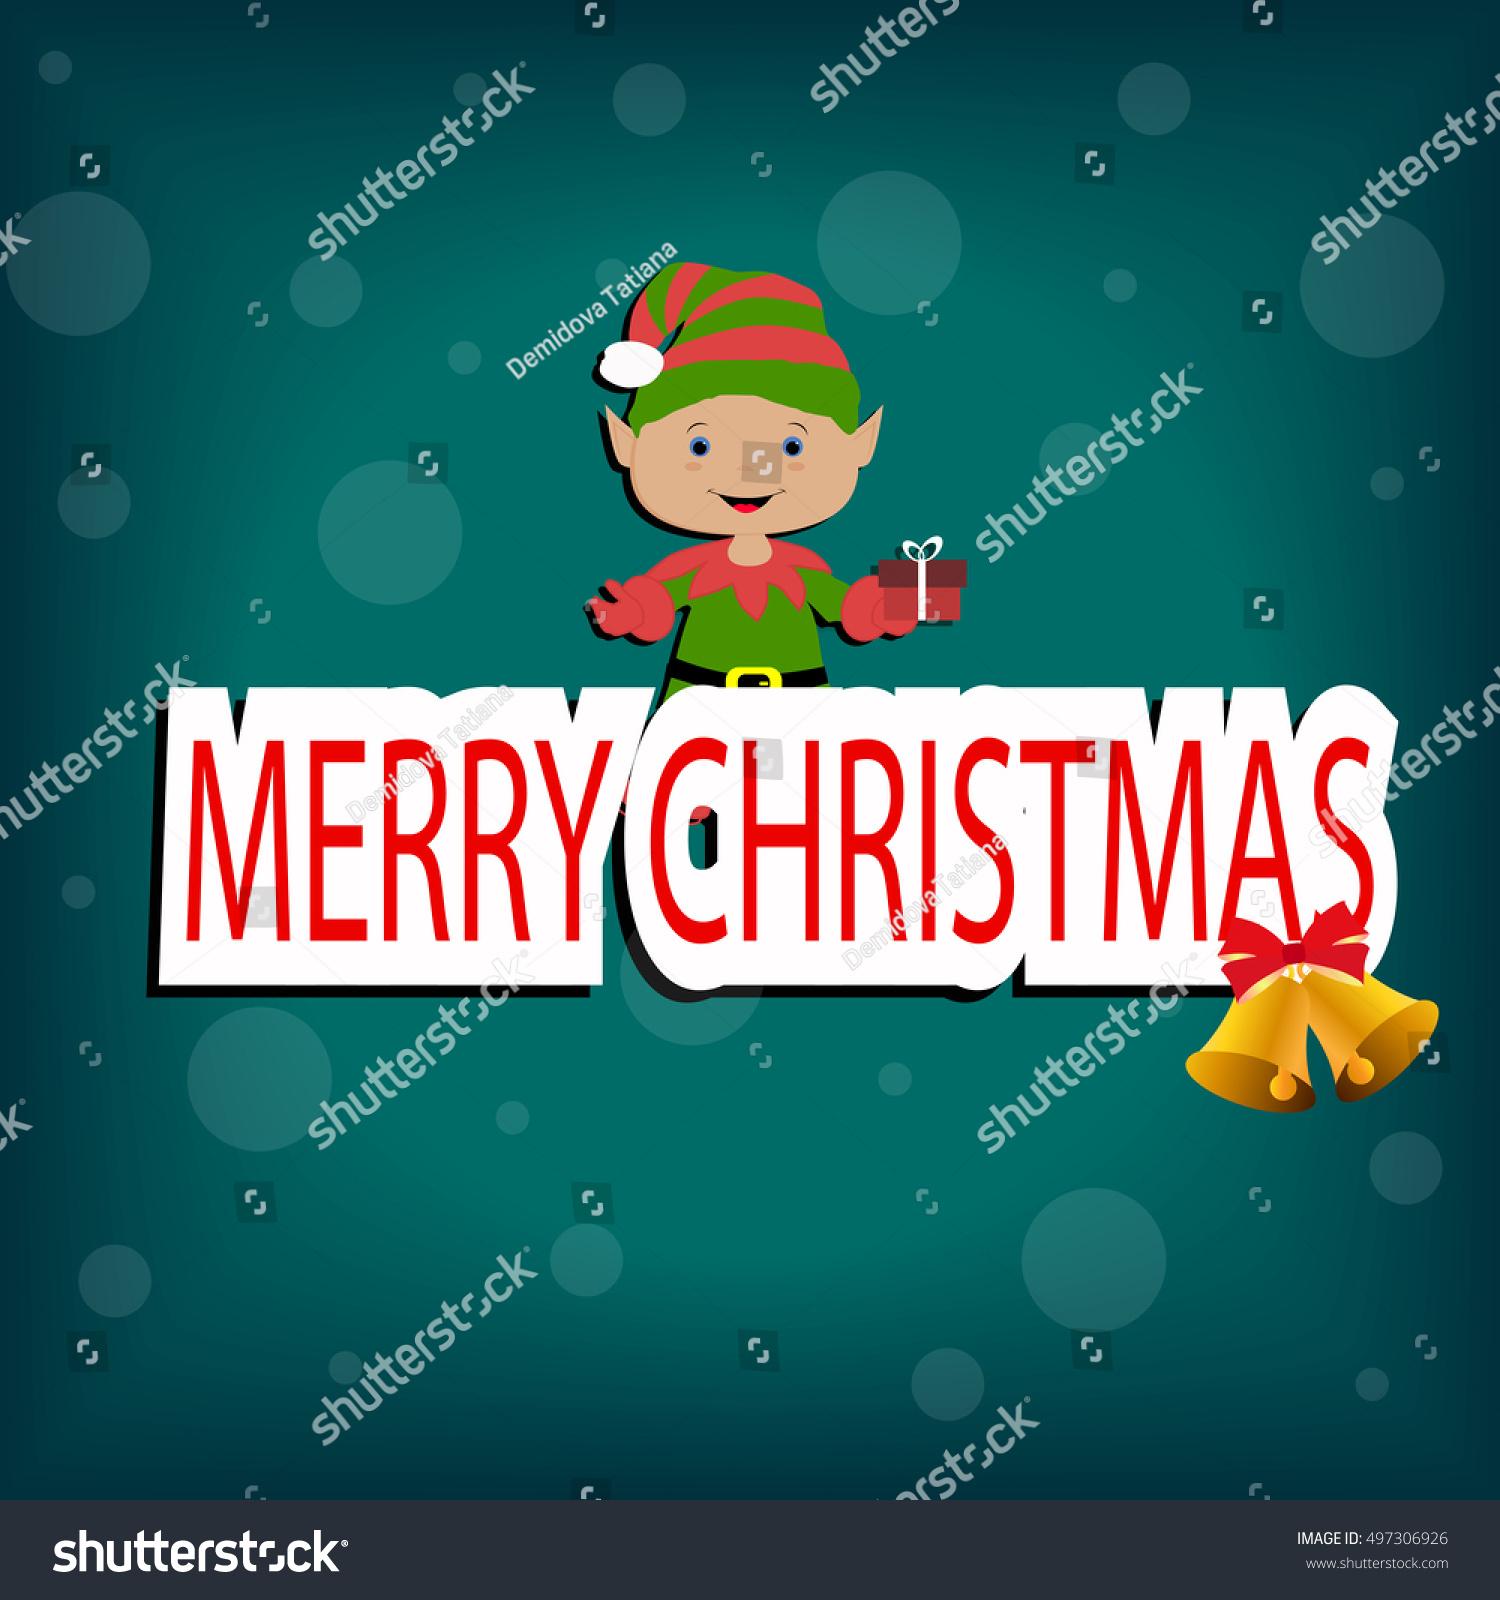 merry christmas elf template postcard greeting new year vector illustration - Merry Christmas Elf